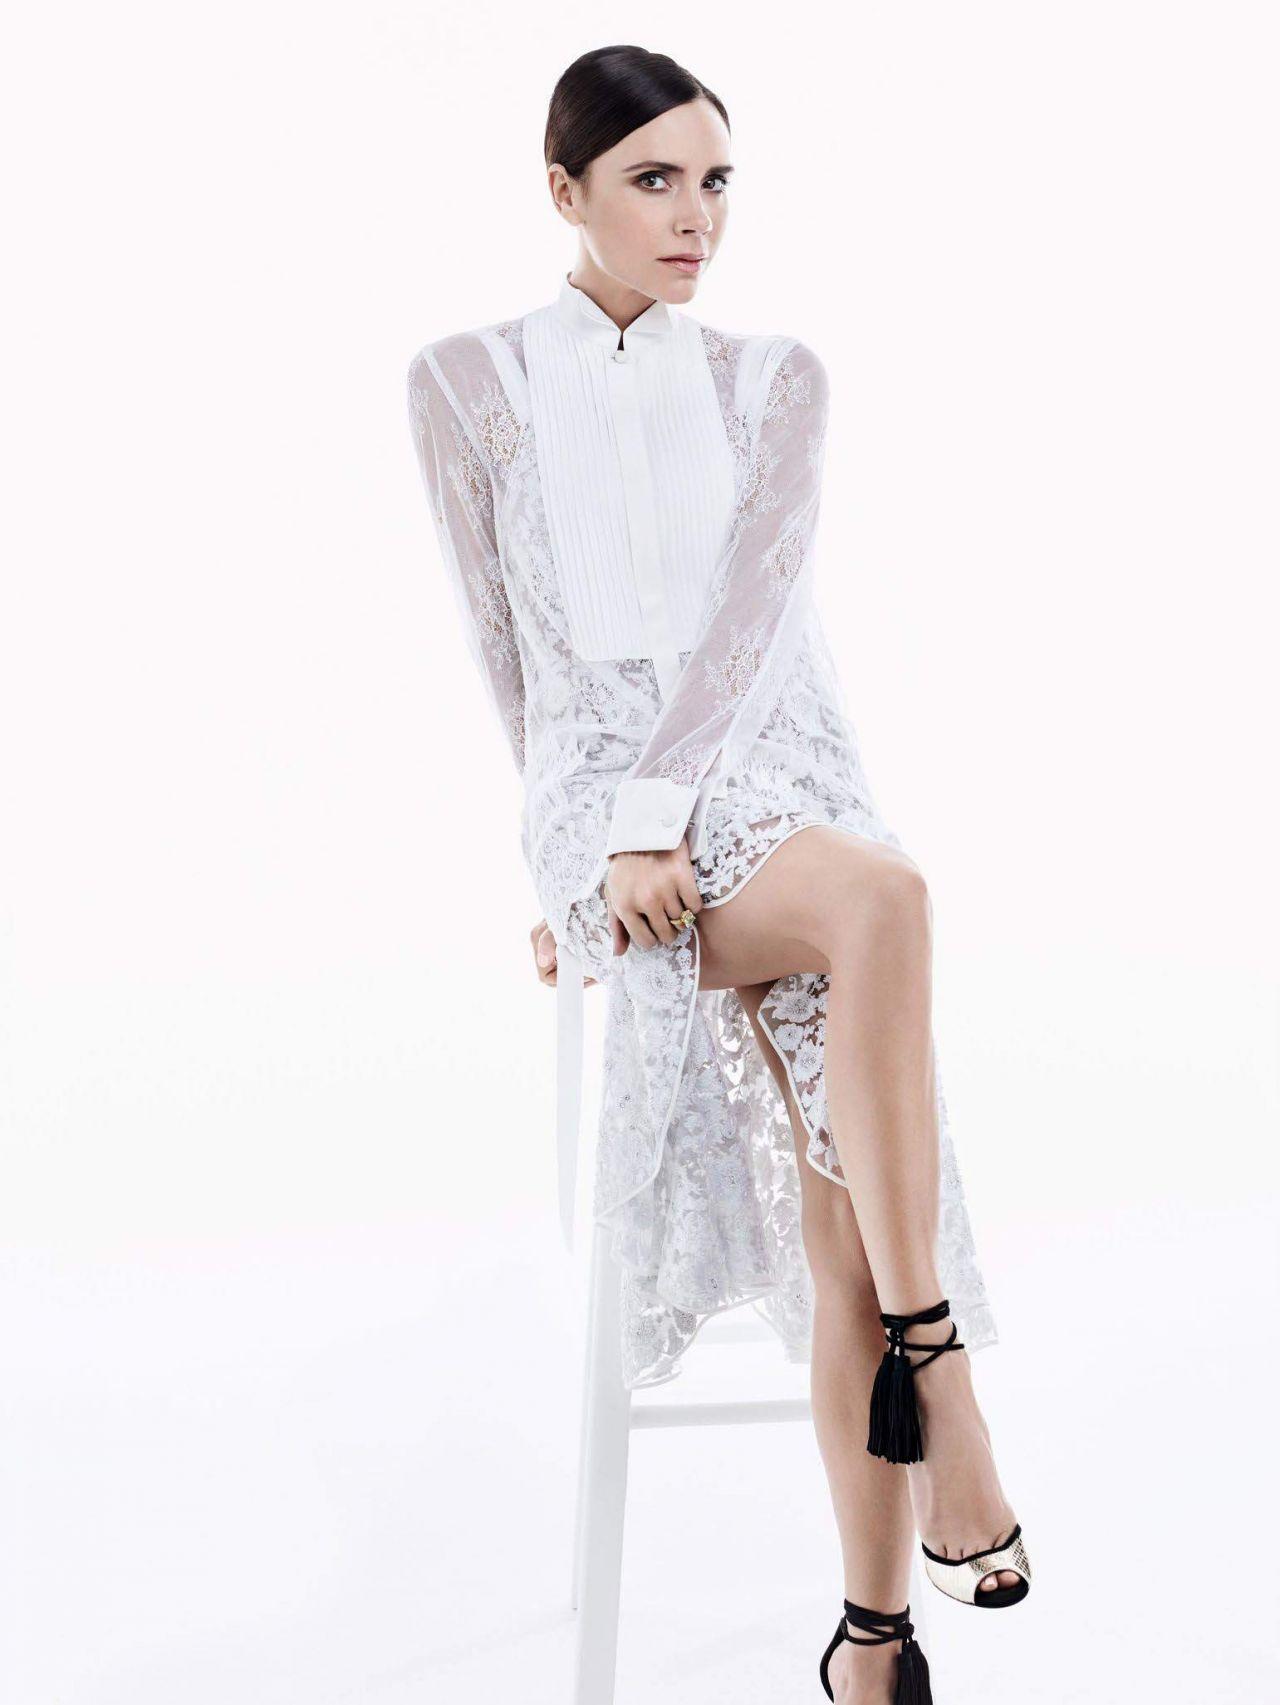 Victoria Beckham - Photoshoot for Vogue China May 2016 ... Victoria Beckham